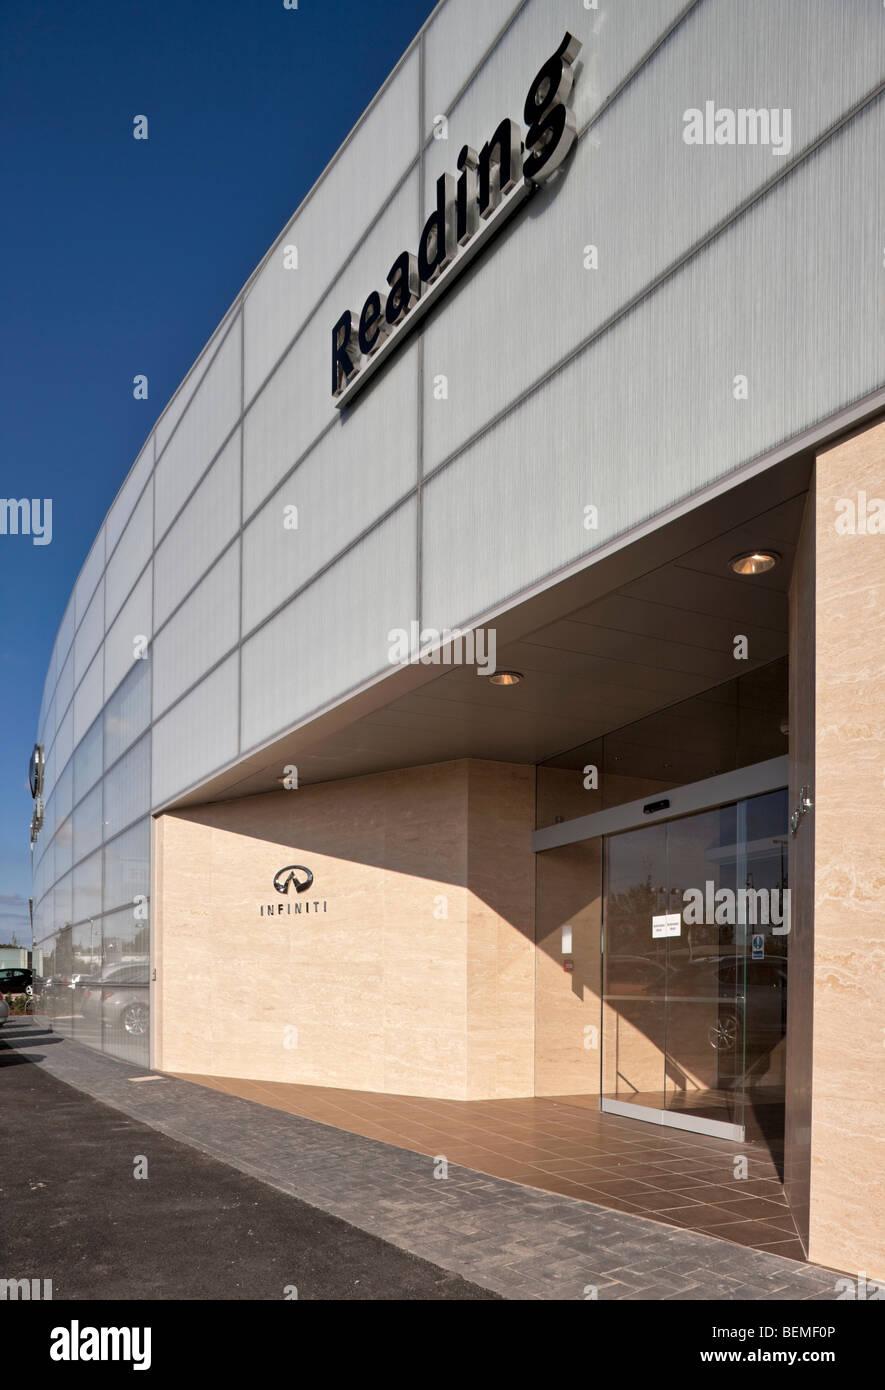 Infiniti Car Showroom In Reading Stock Photo 26266374 Alamy